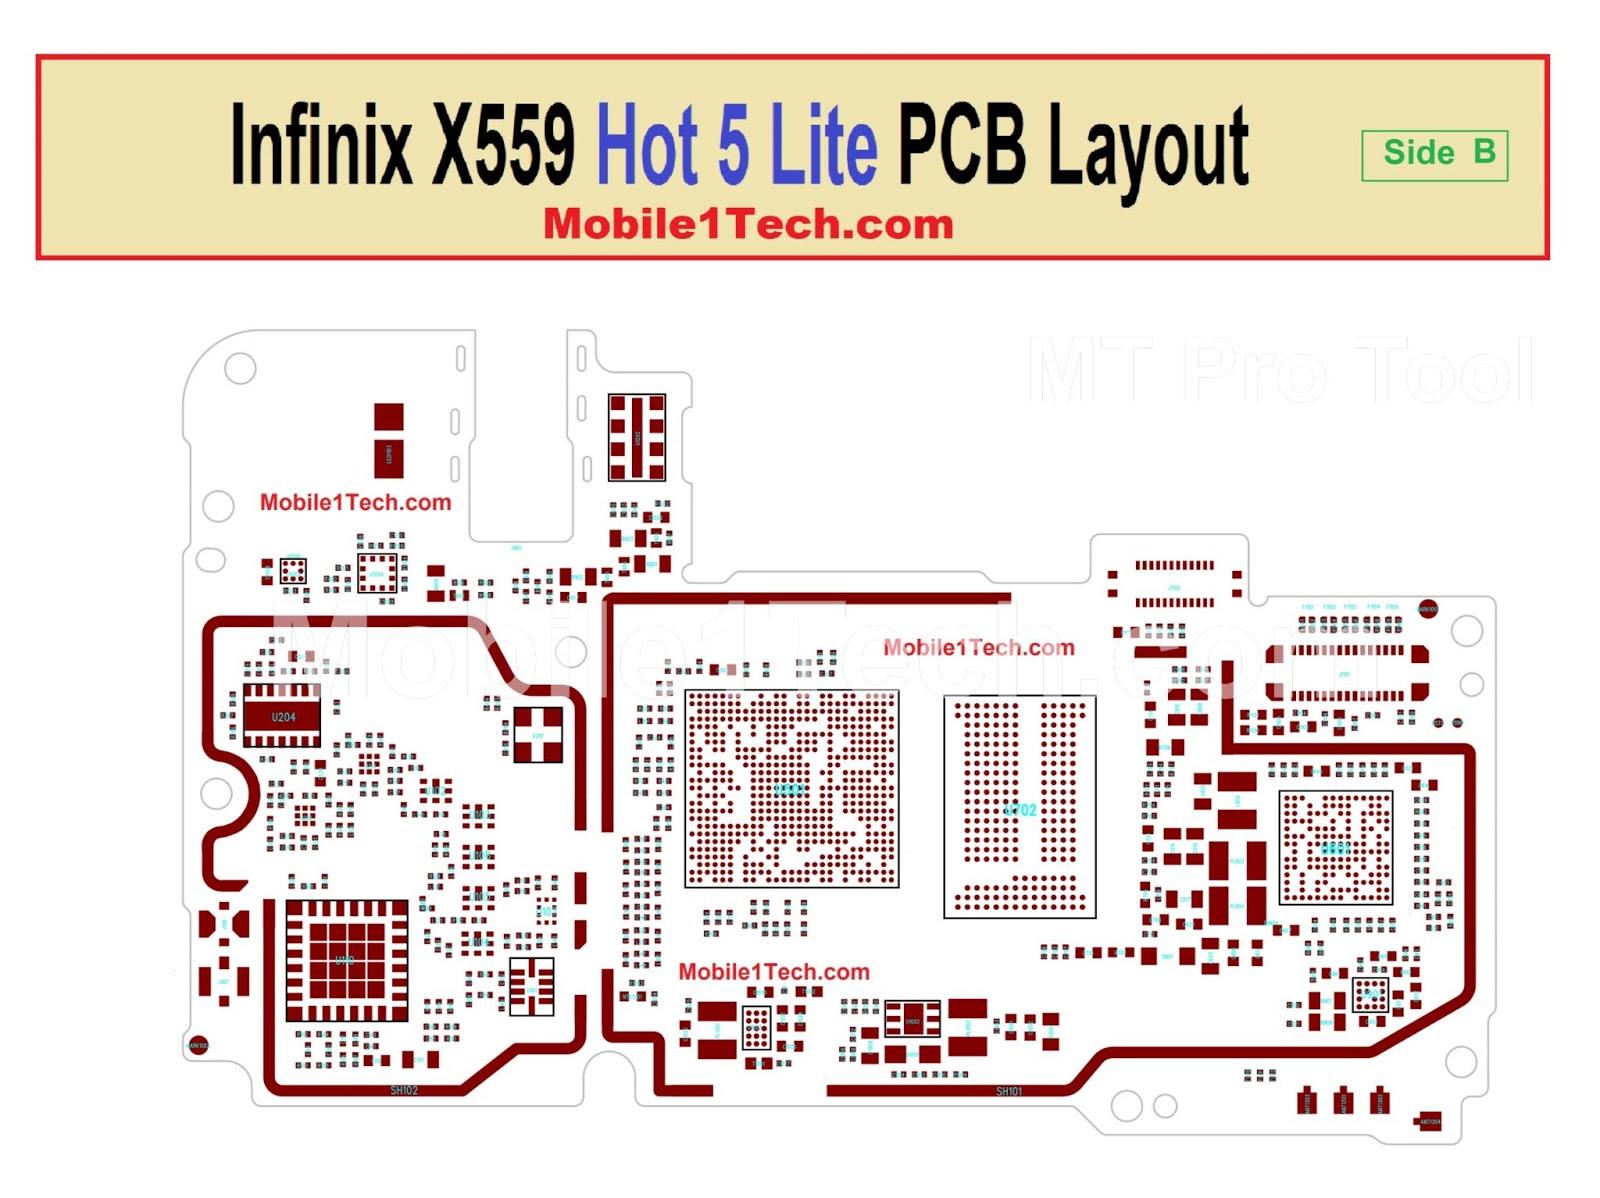 Infinix X559 Hot 5 Lite Pcb Layout